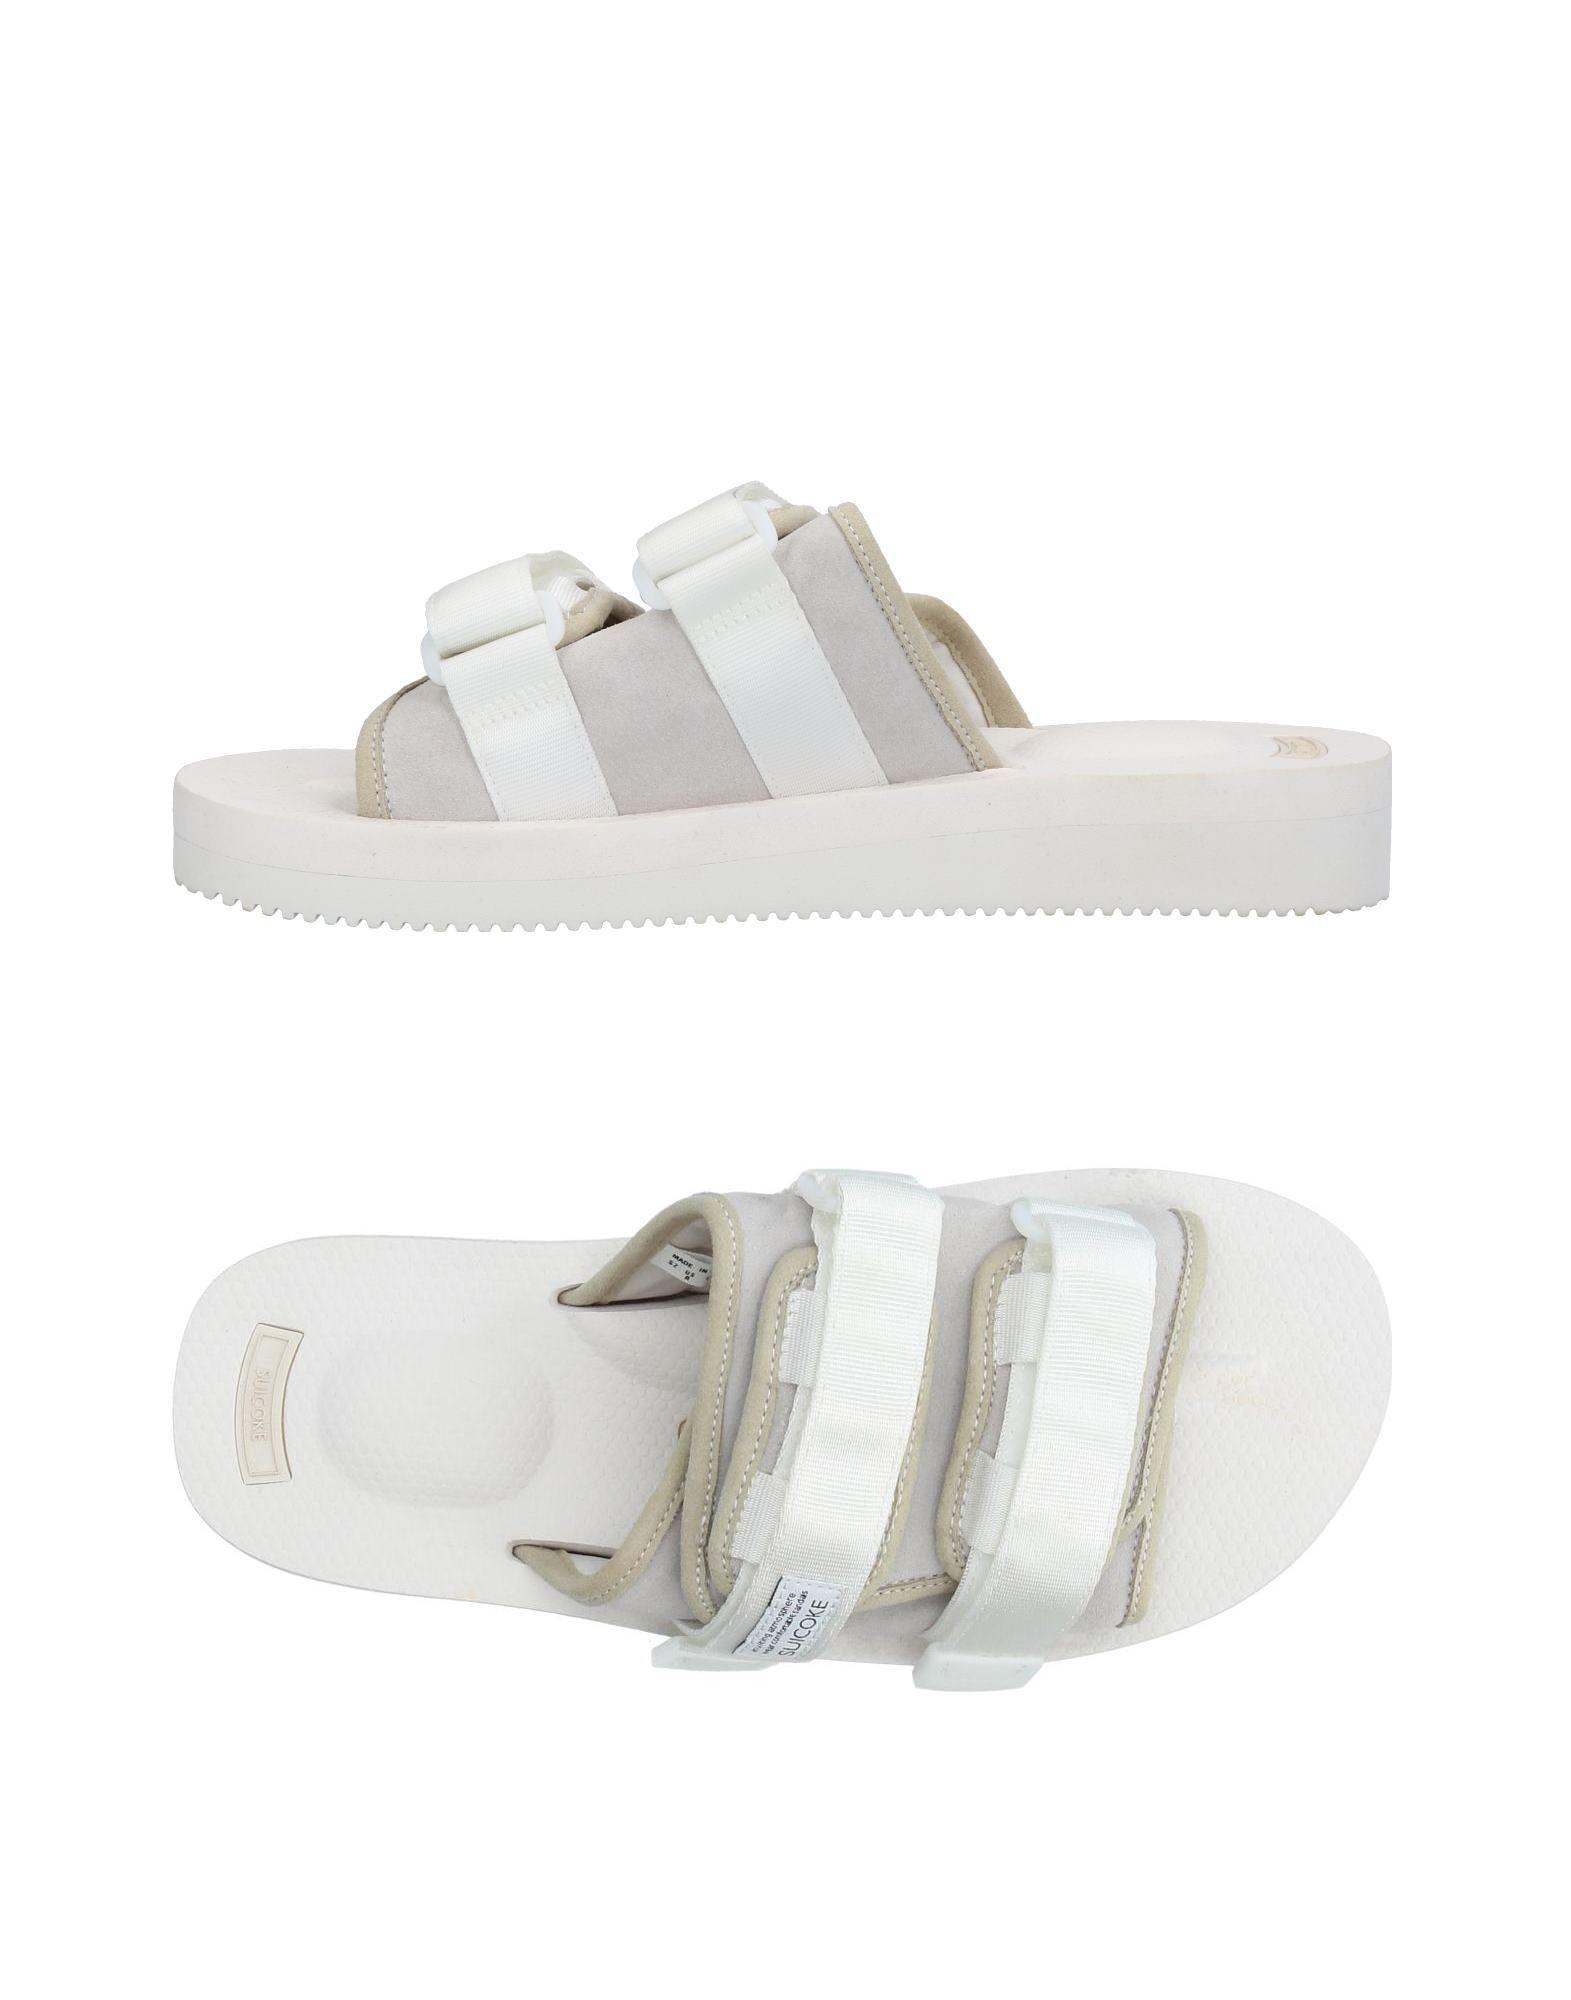 Suicoke White Metallic Toe Boots gDbTiqnLr